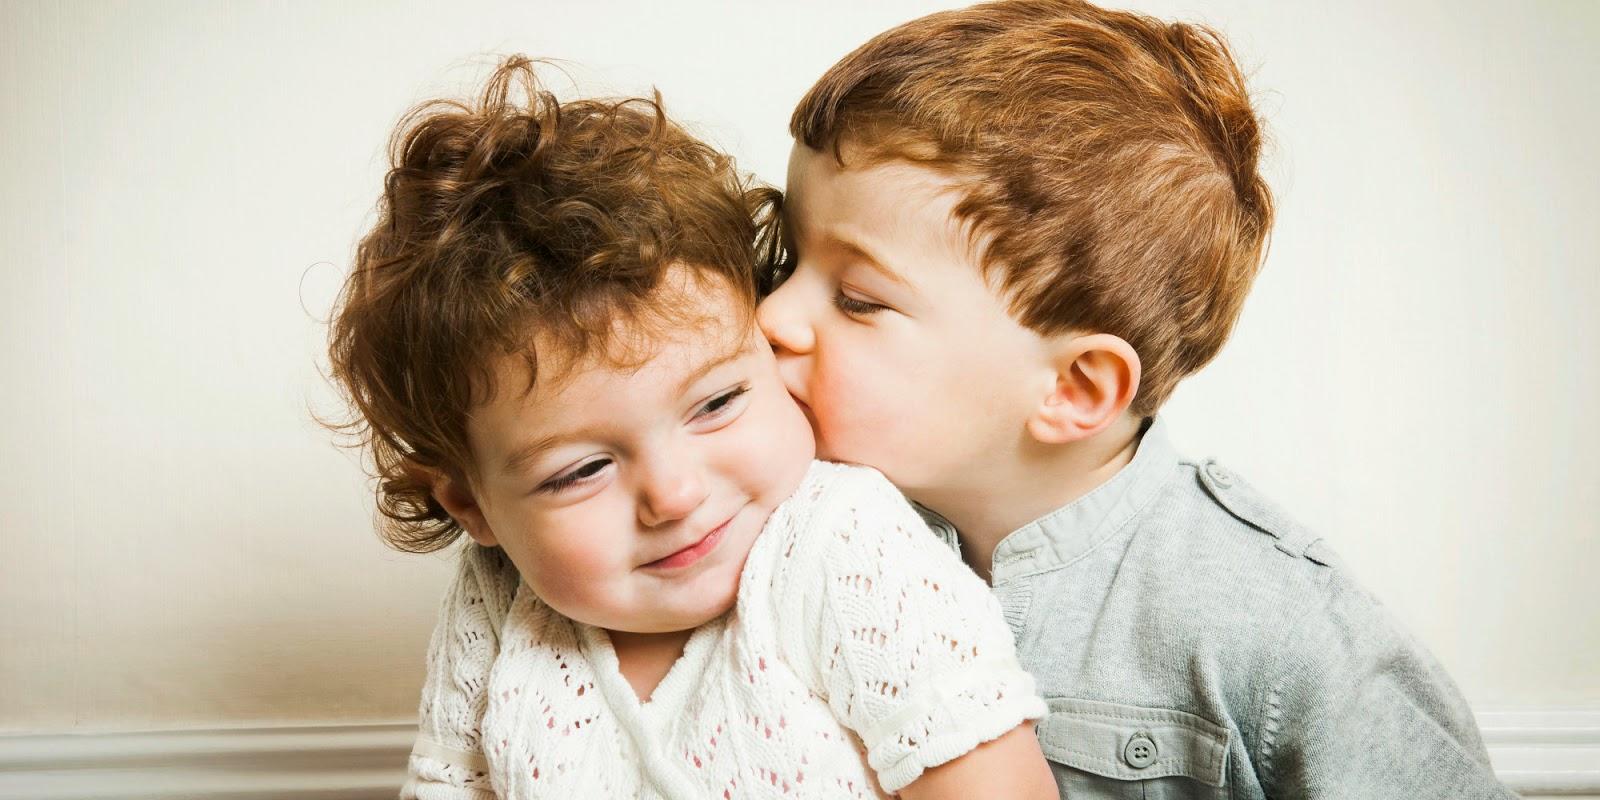 Boy kiss girl romantic